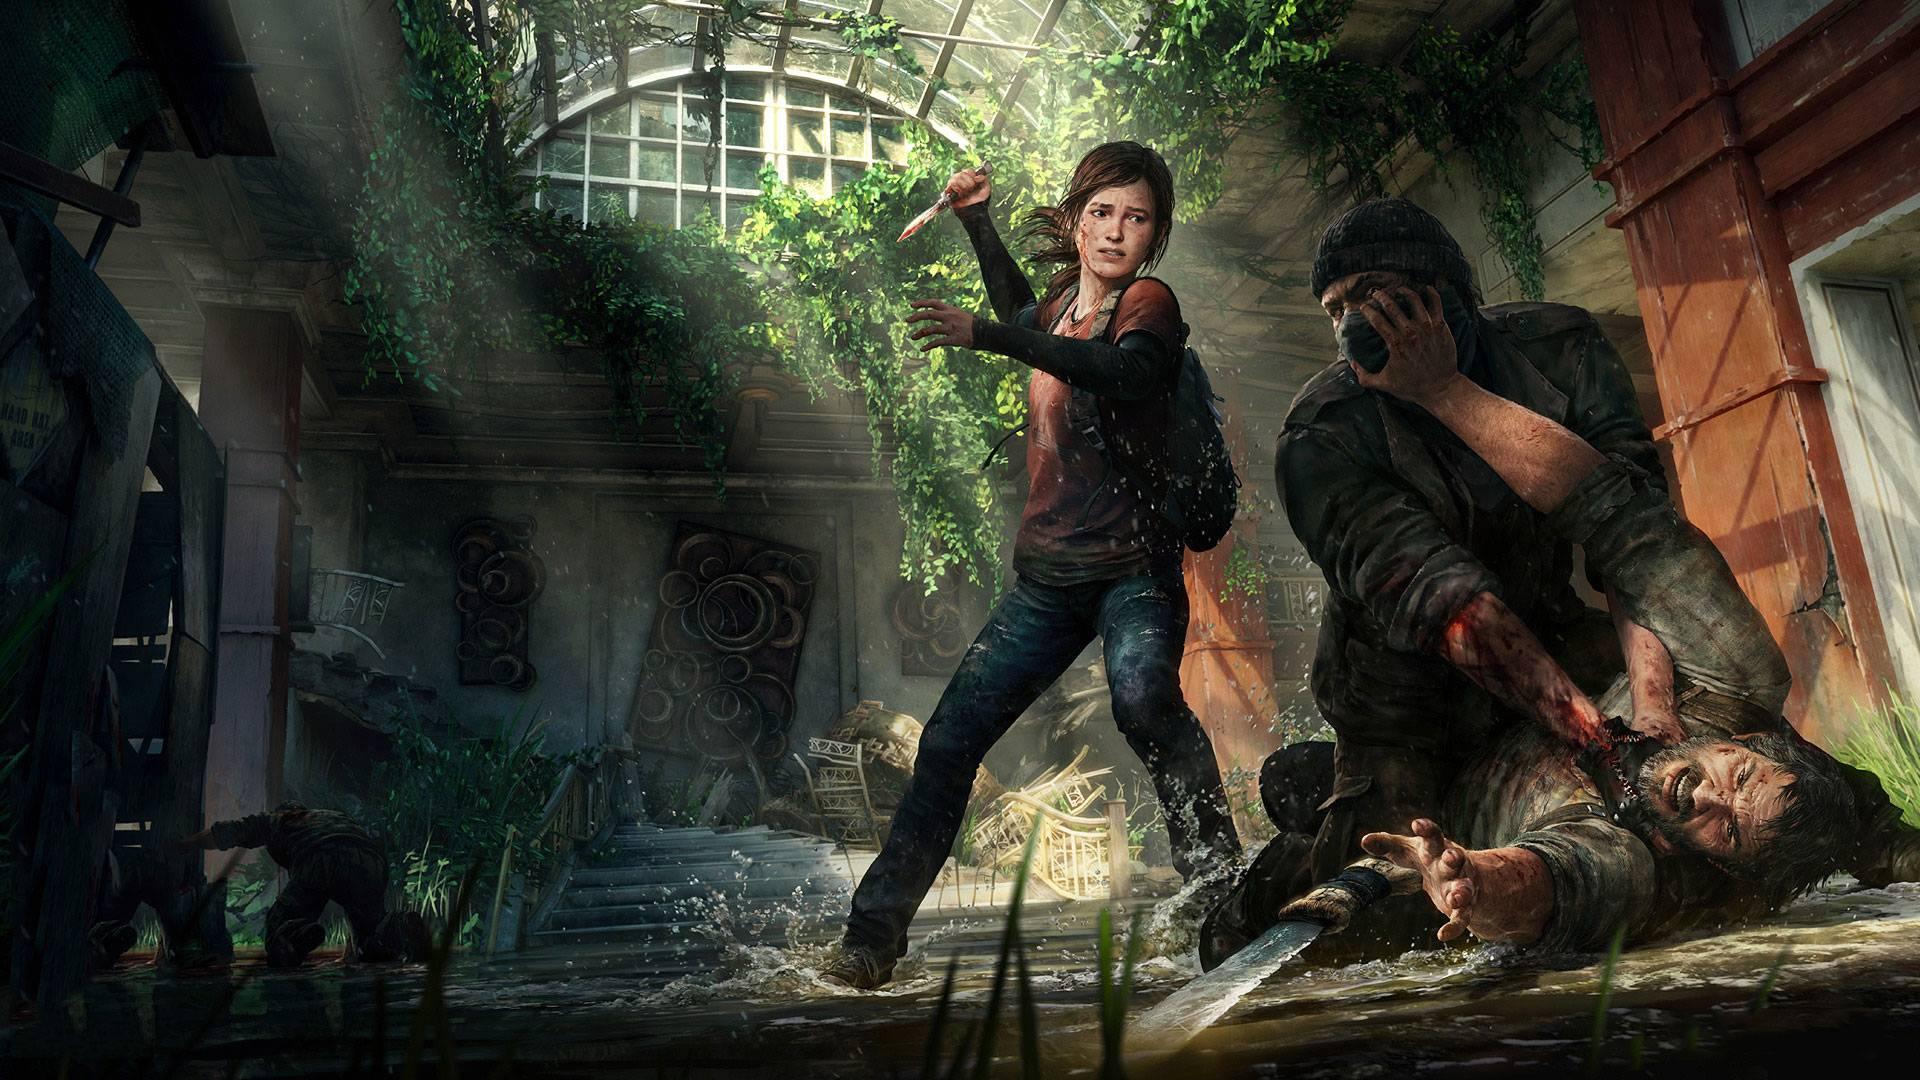 СМИ: Naughty Dog делает ремейк The Last of Us, а Bend Studio отказали в сиквеле Days Gone